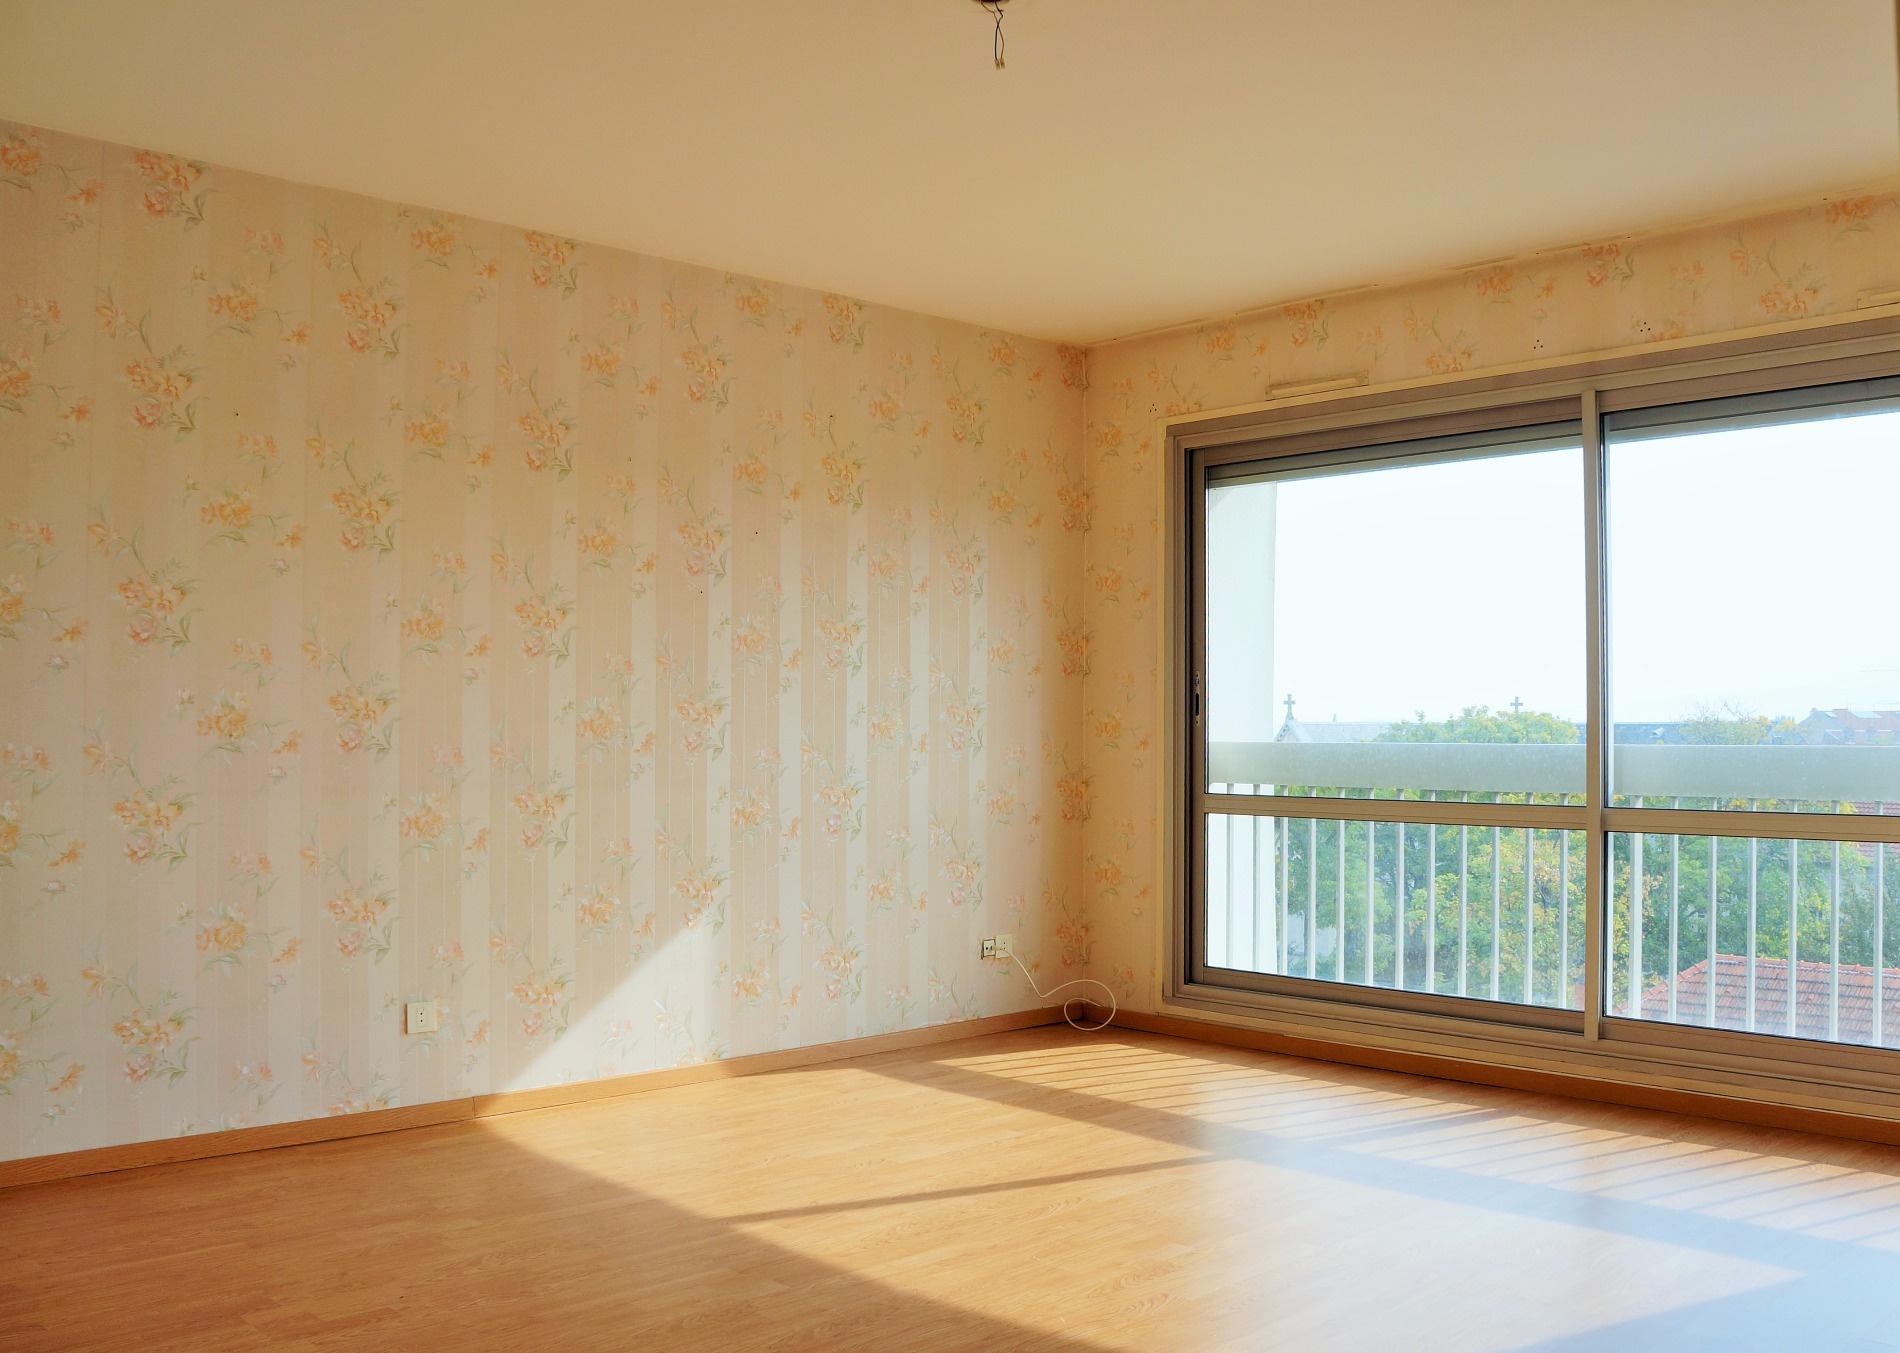 Astuce immo l 39 immobilier heillecourt nancy vandoeuvre for Astuce appartement